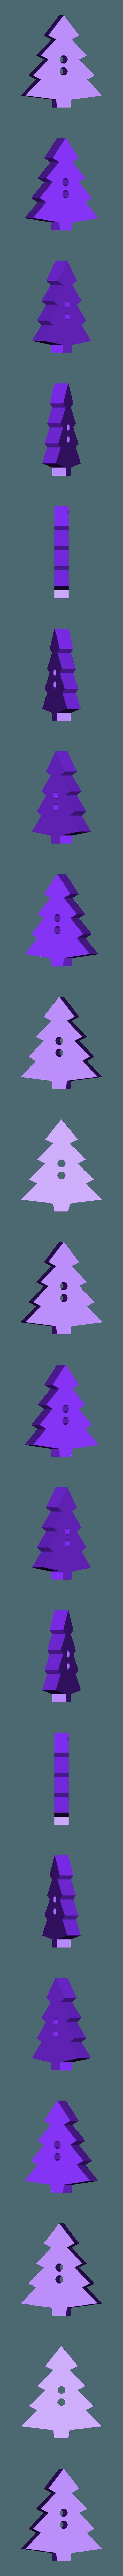 Christmas Tree Button.stl Download free STL file Christmas Tree Button • 3D printing model, Lucy_Haribert